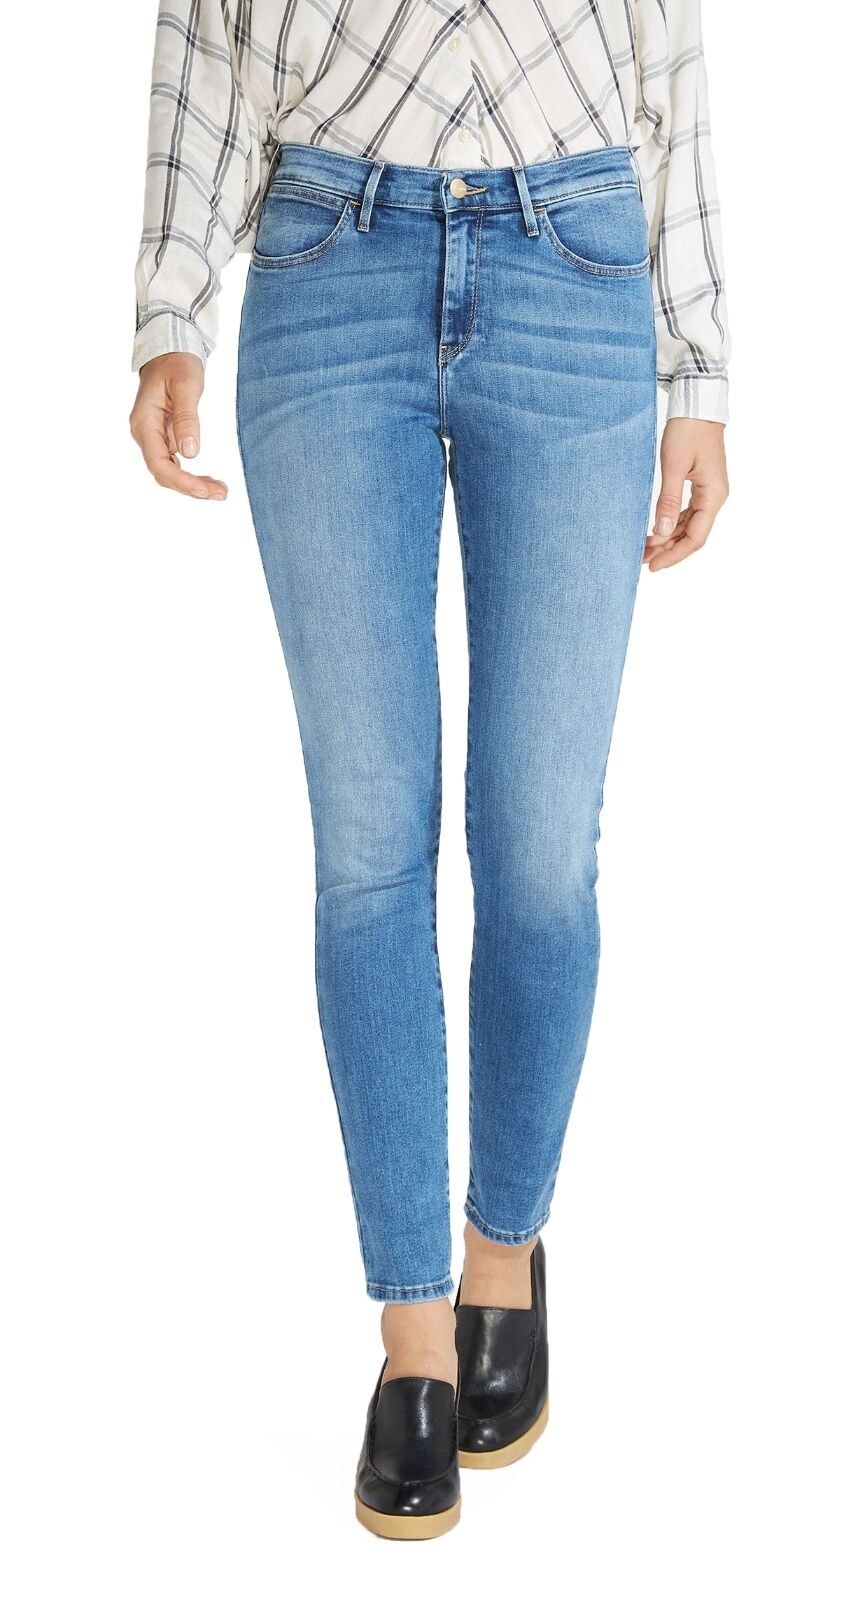 Wrangler High Rise Skinny Flex Stretch Jeans damen Ladies Light Best Blau Denim